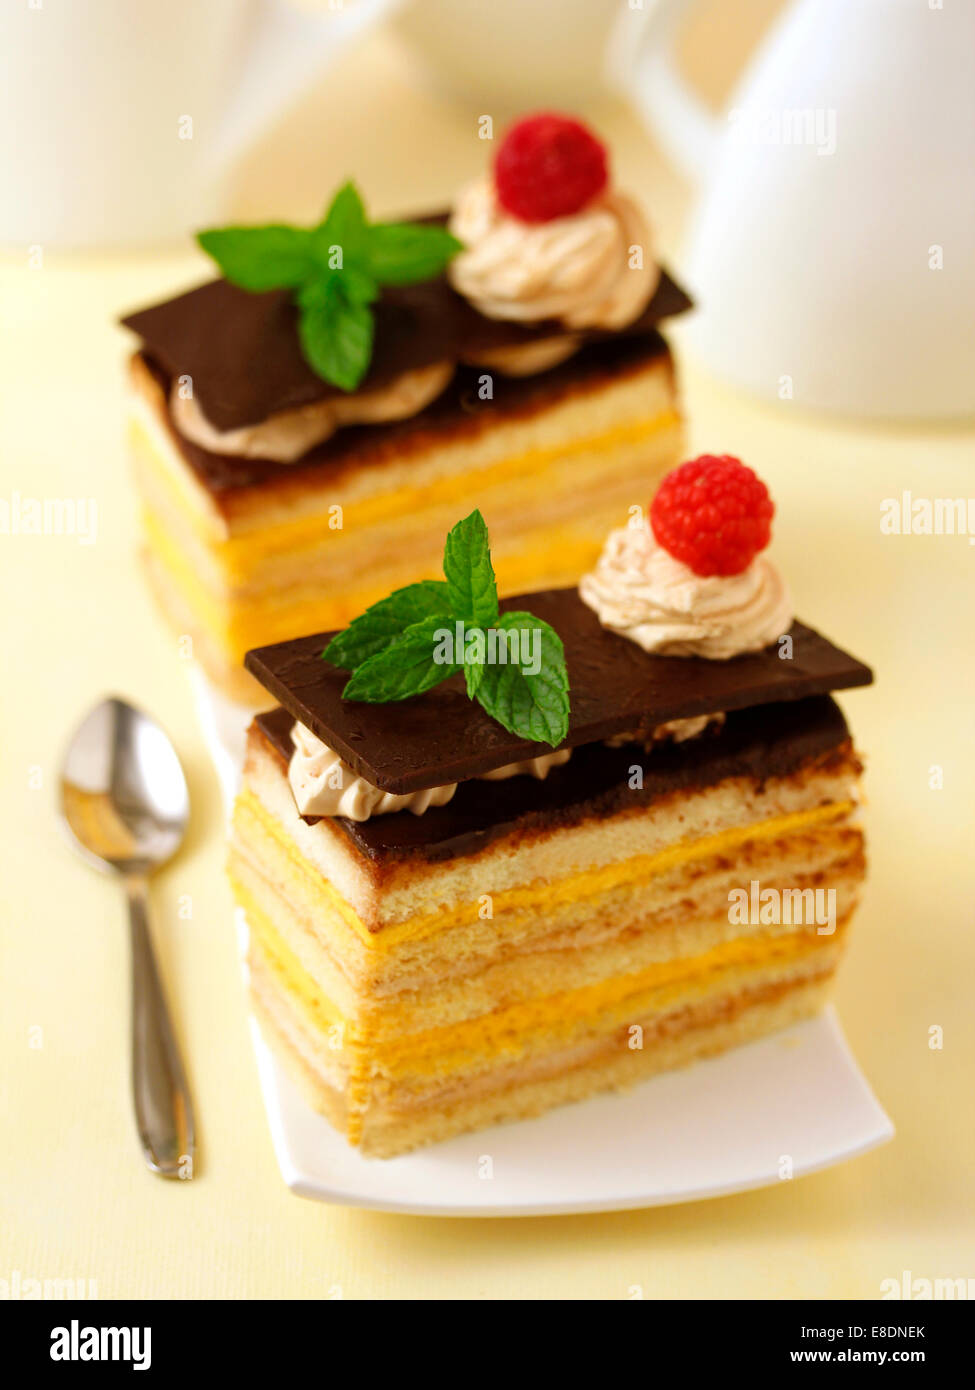 Sponge cake with custard and tiramisu. Recipe available. - Stock Image